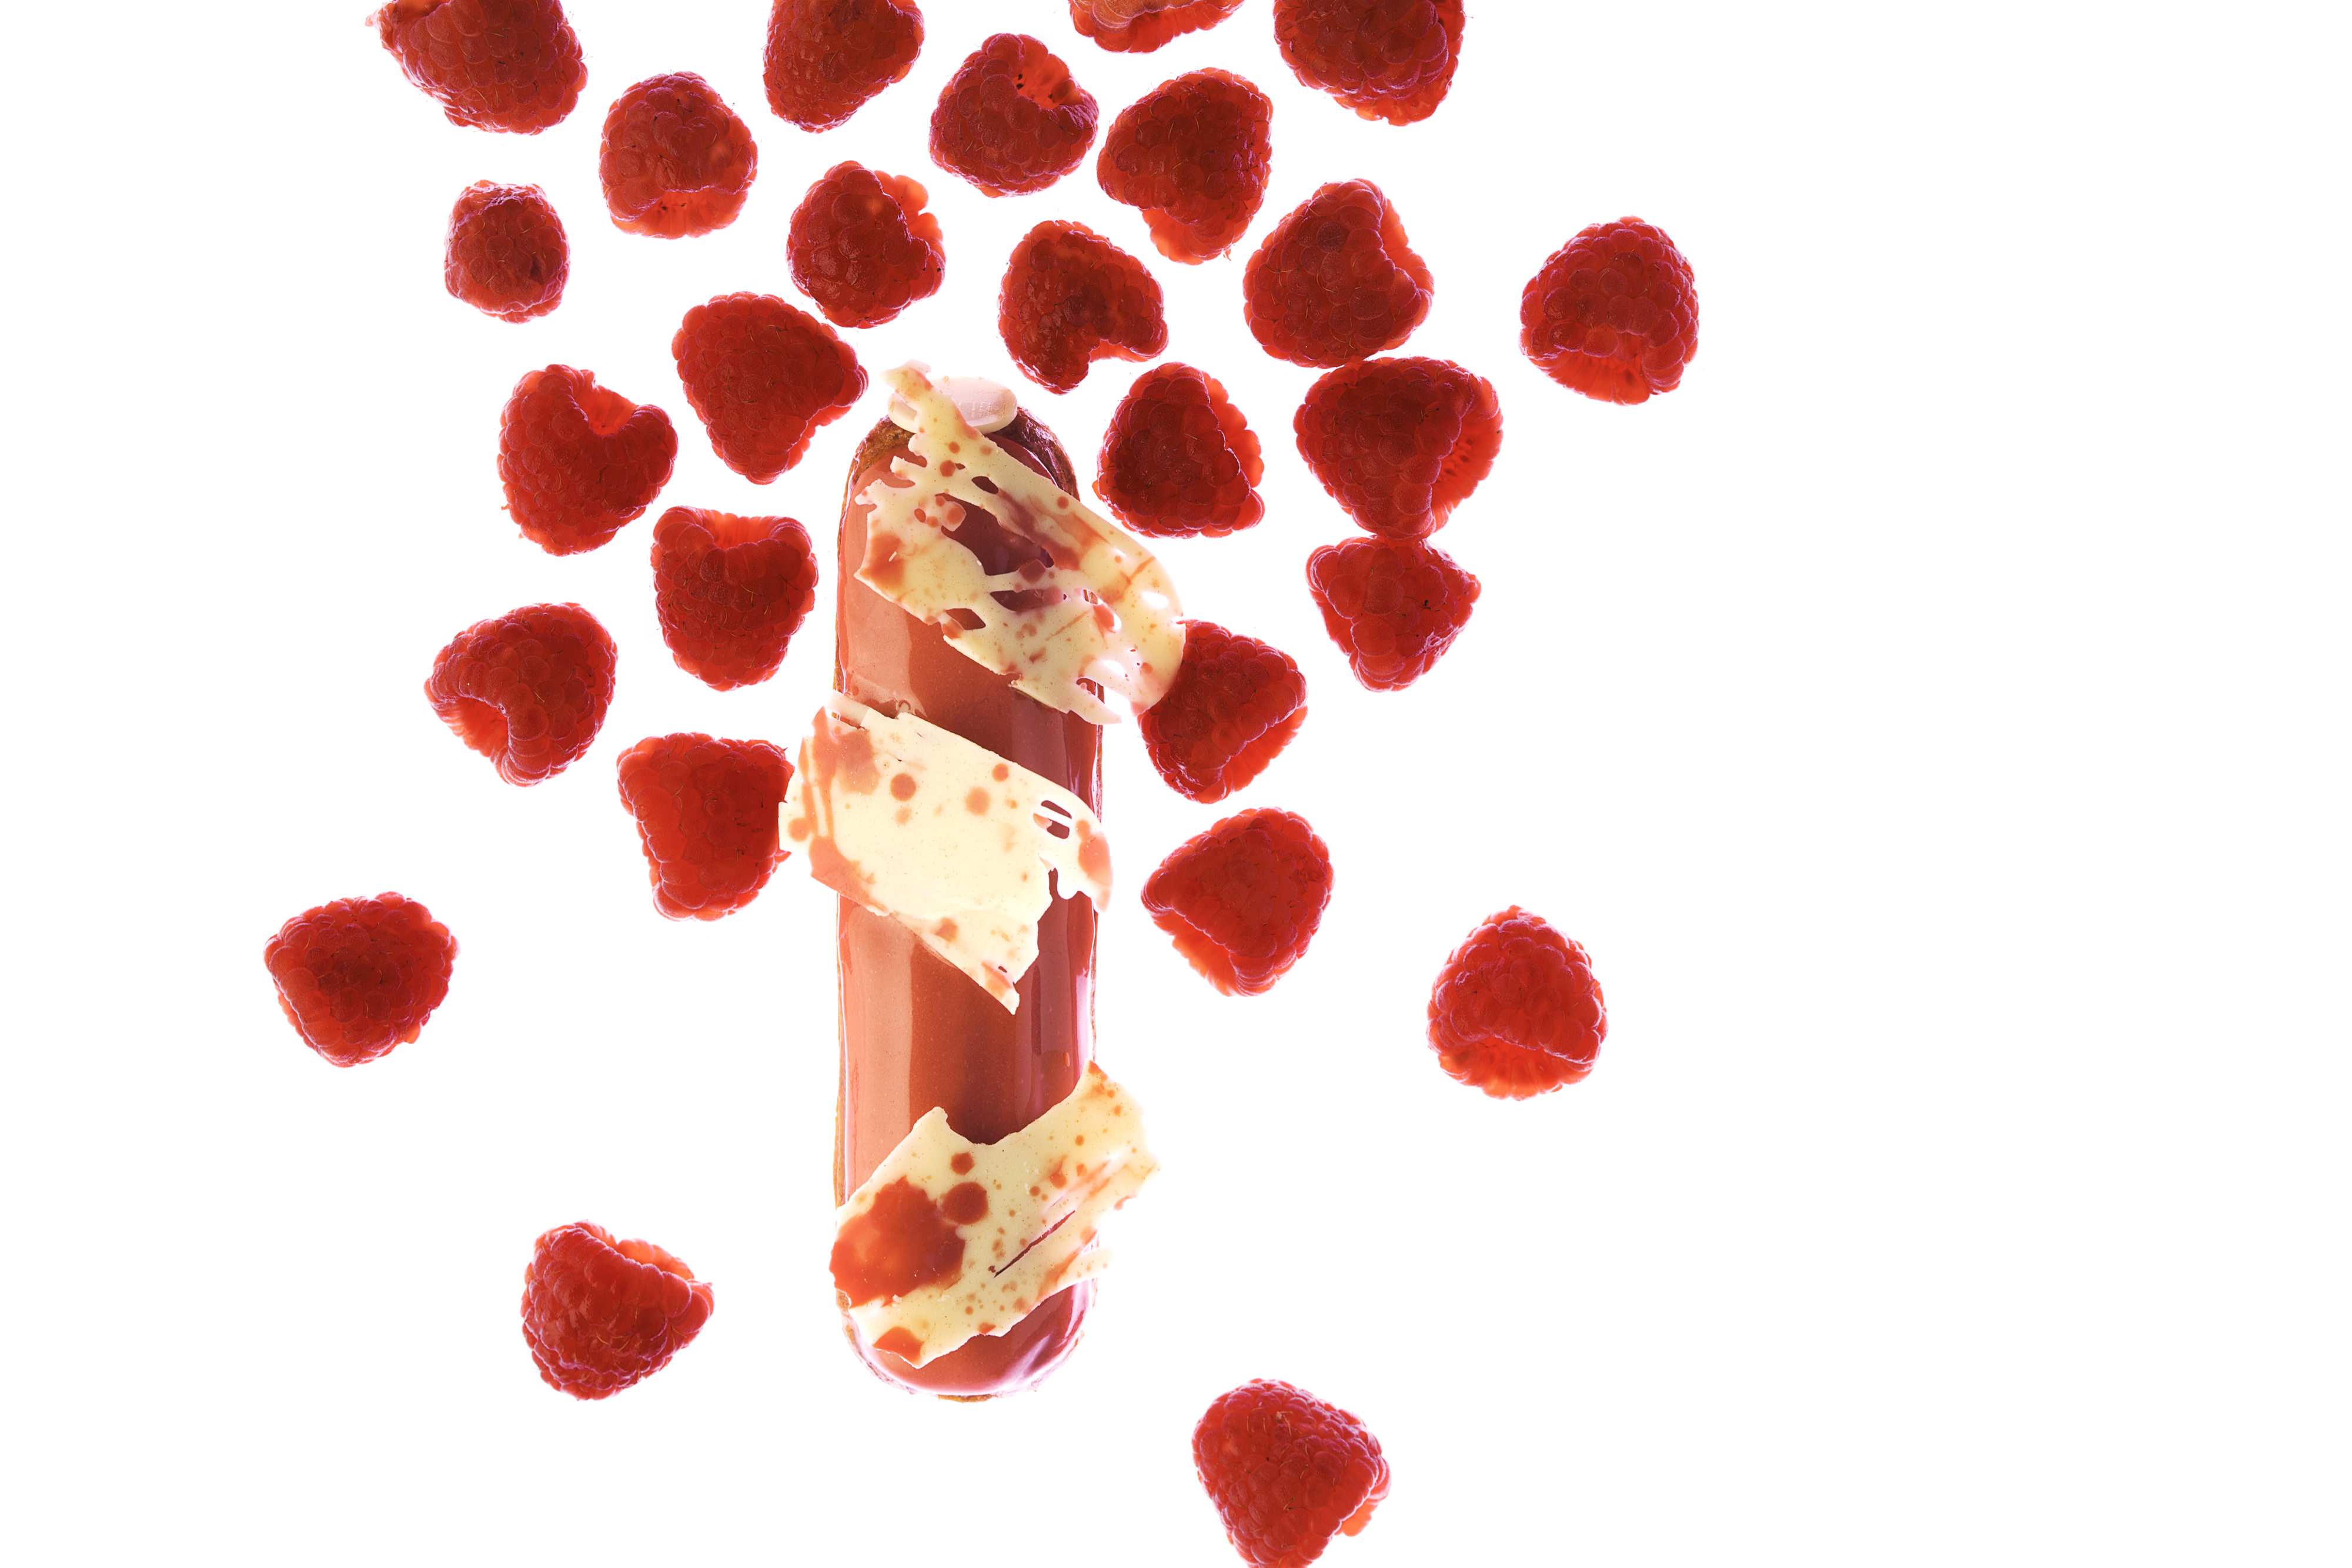 Raspberry Cream Cheese Eclair